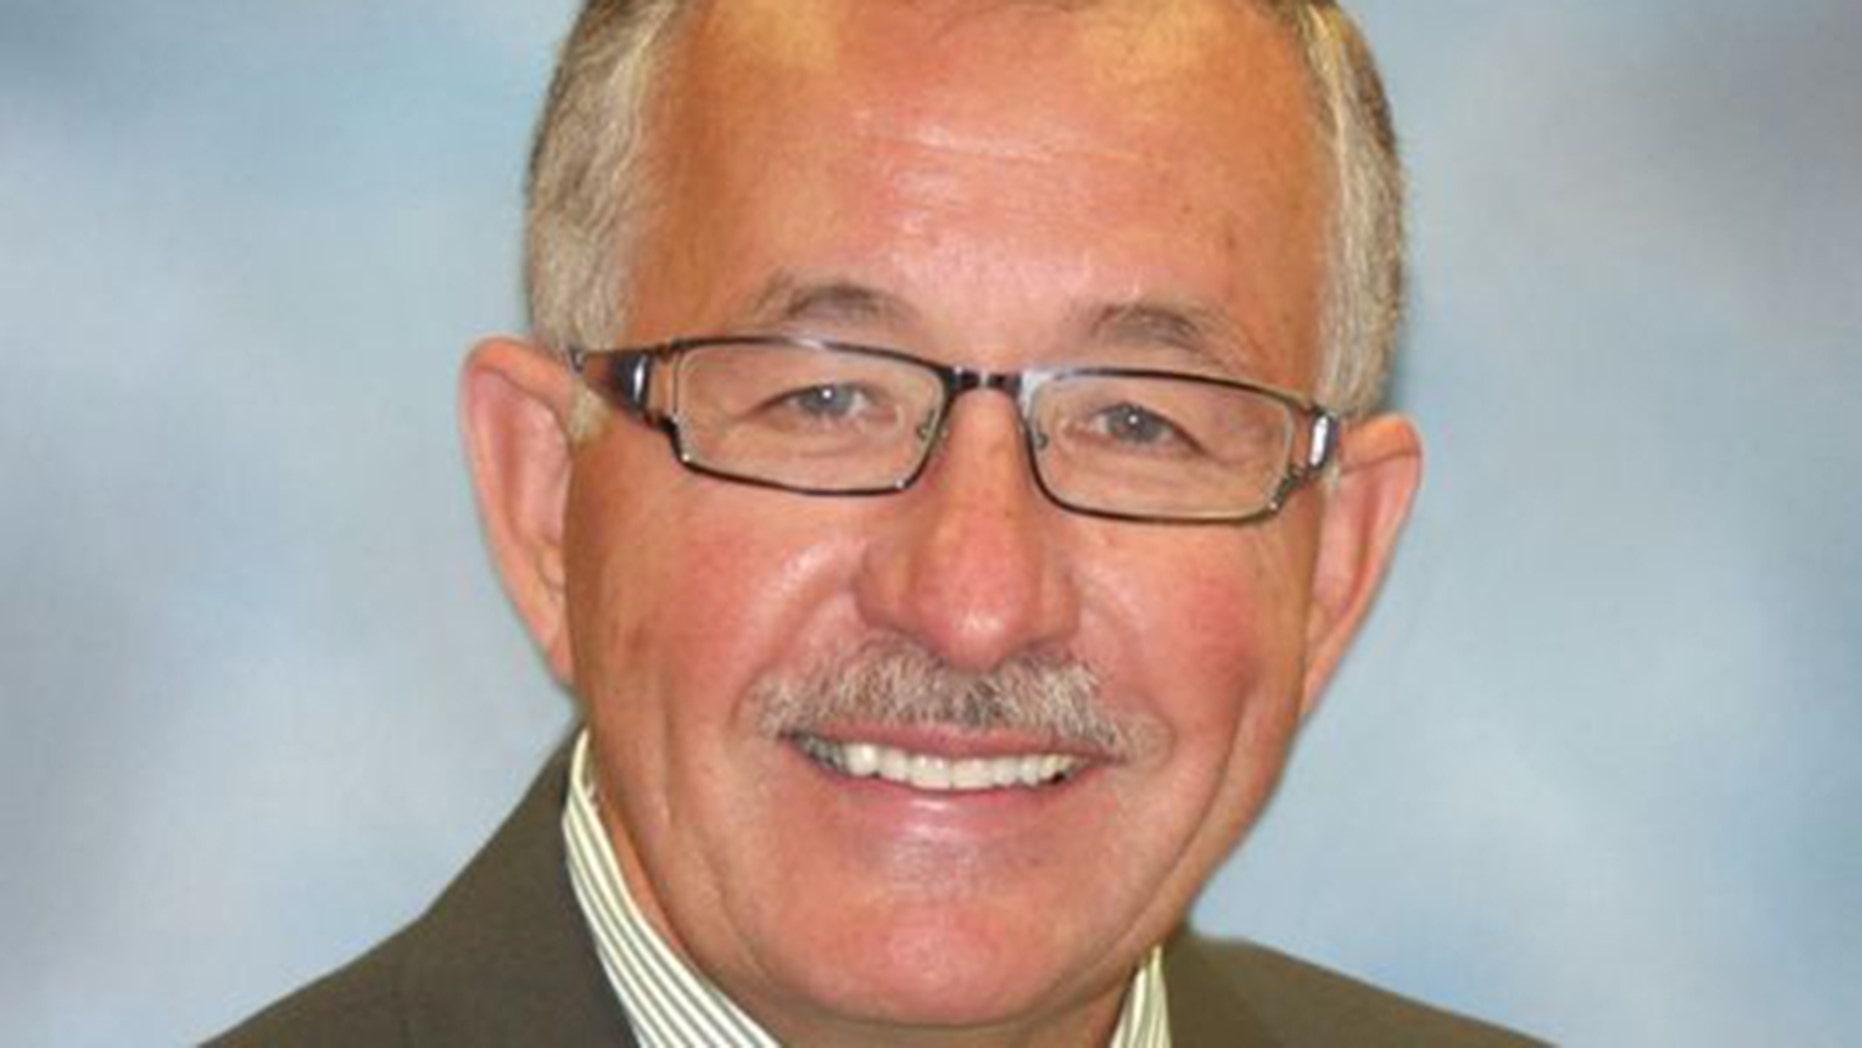 William Strampel, Larry Nassar's former boss at Michigan State University, stepped down Thursday for health reasons.